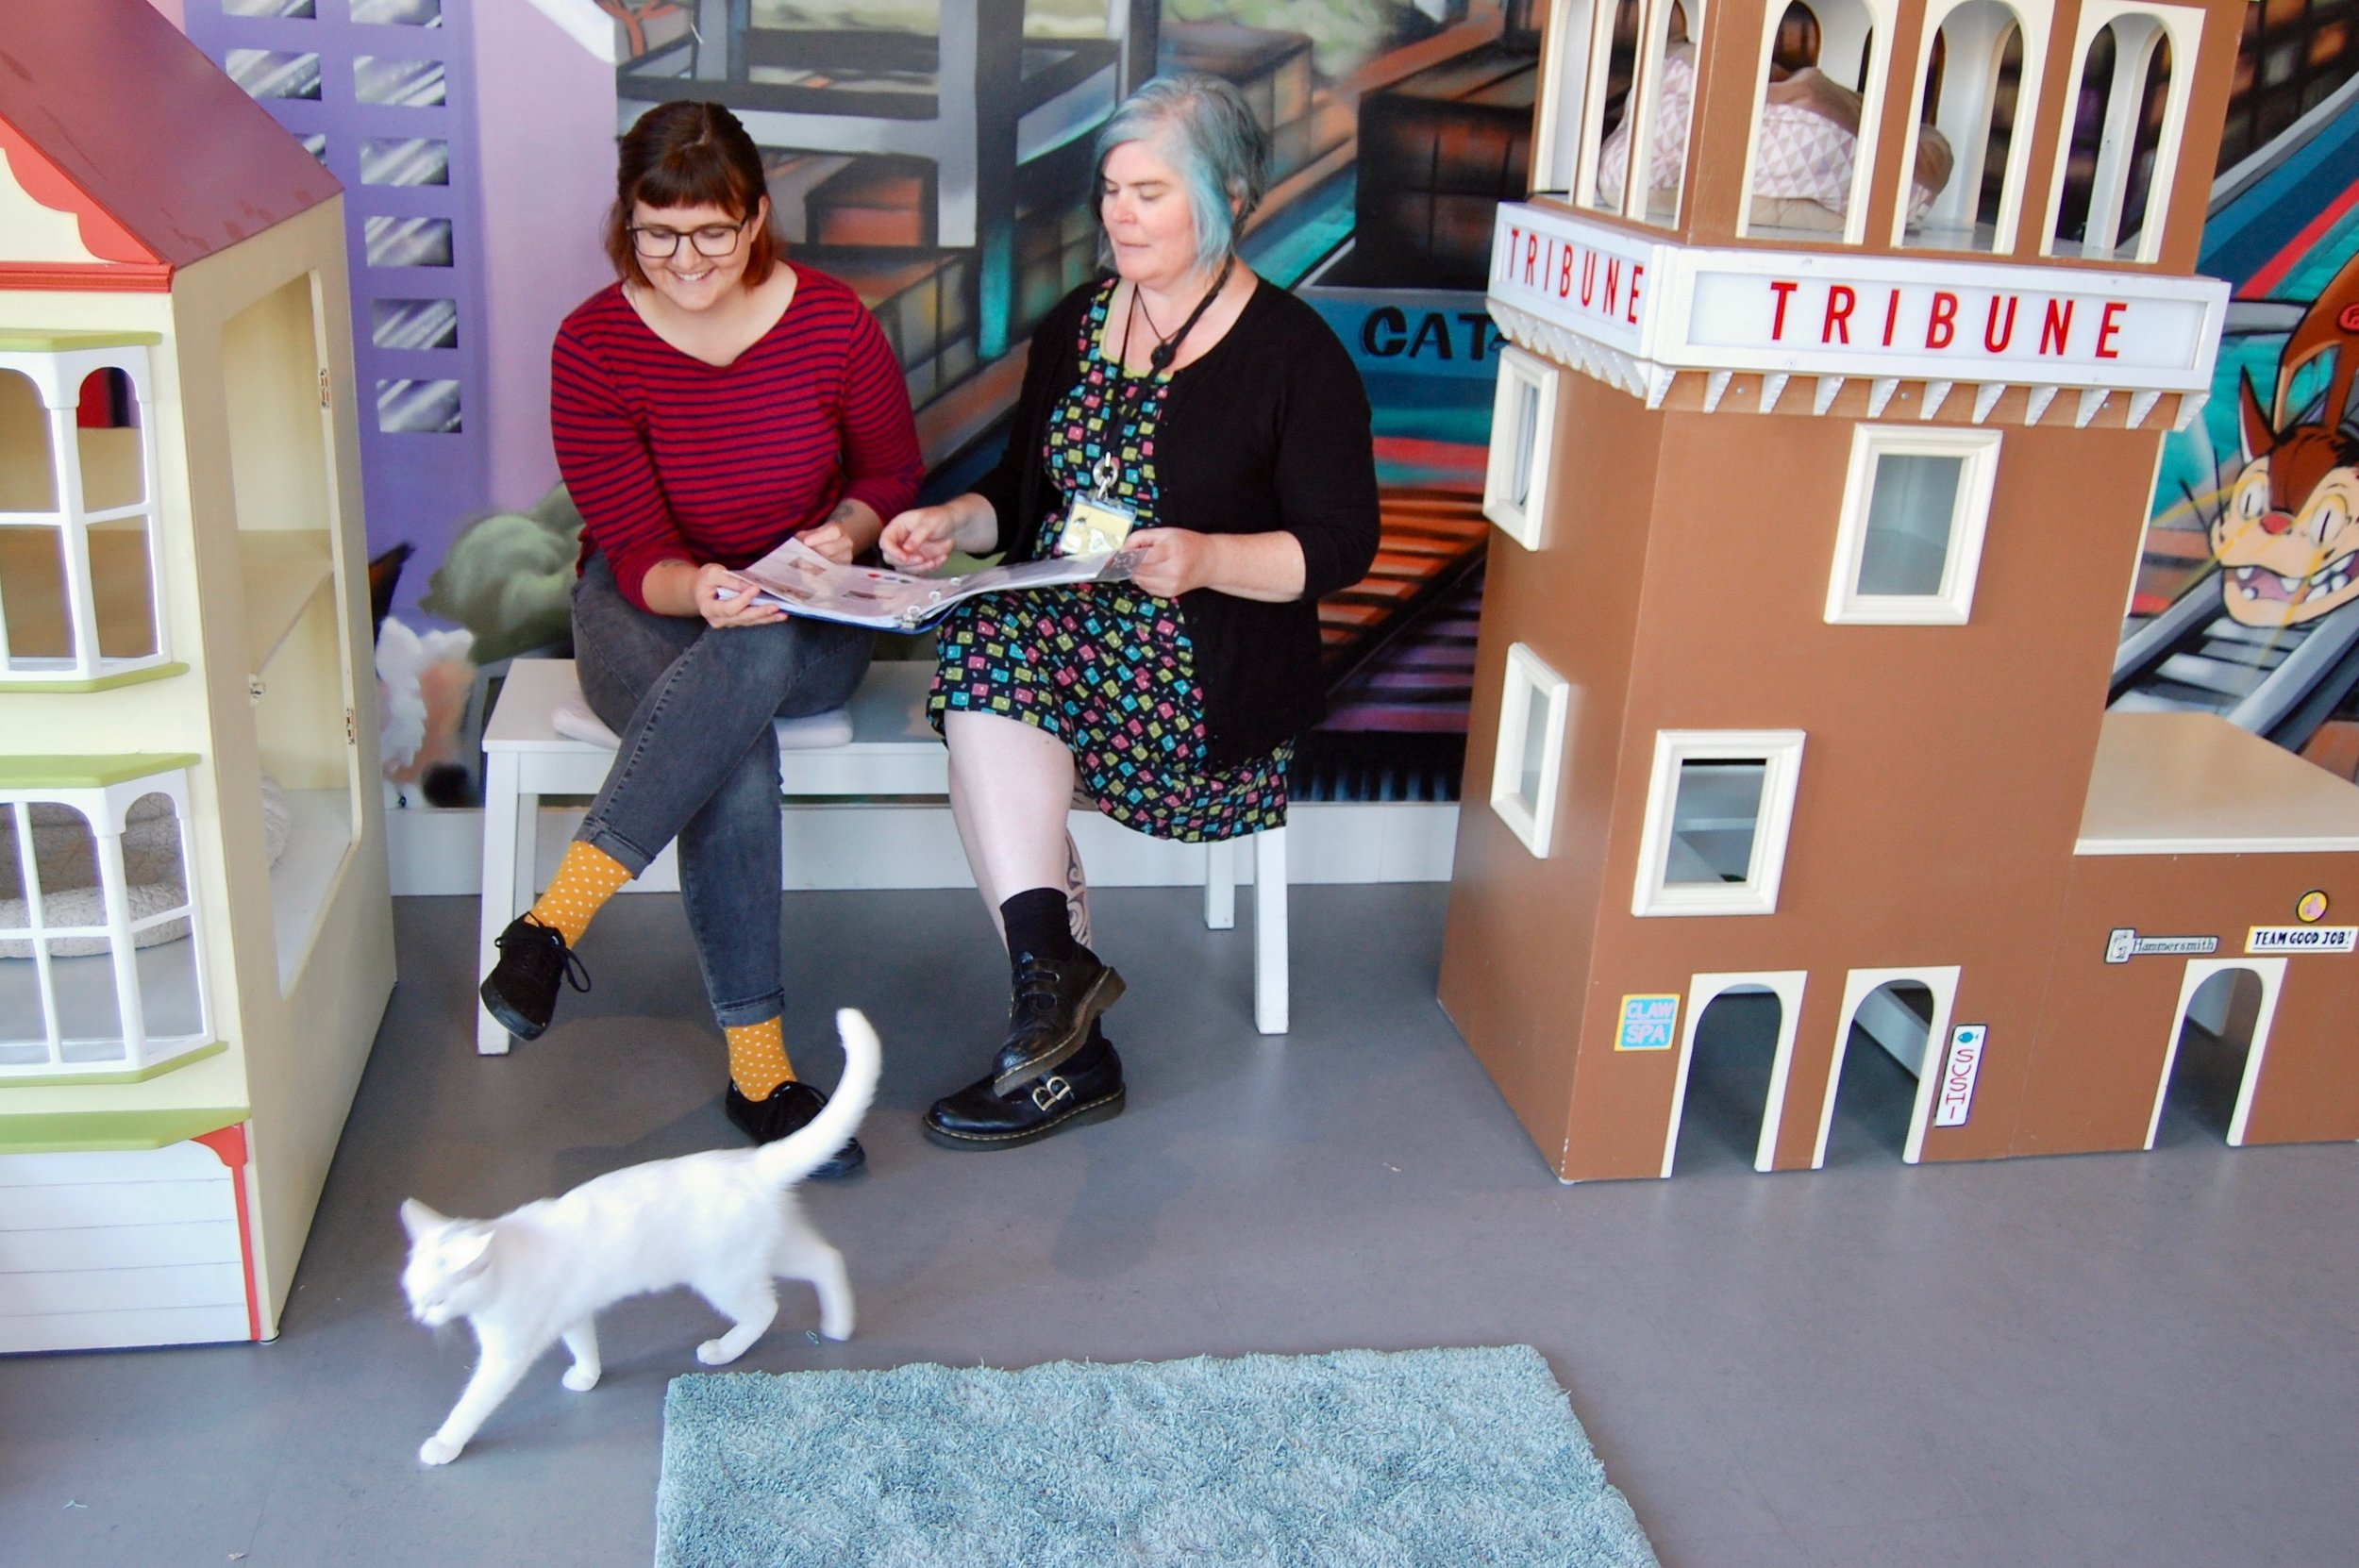 Maureen during a Cat Zone volunteer shift.